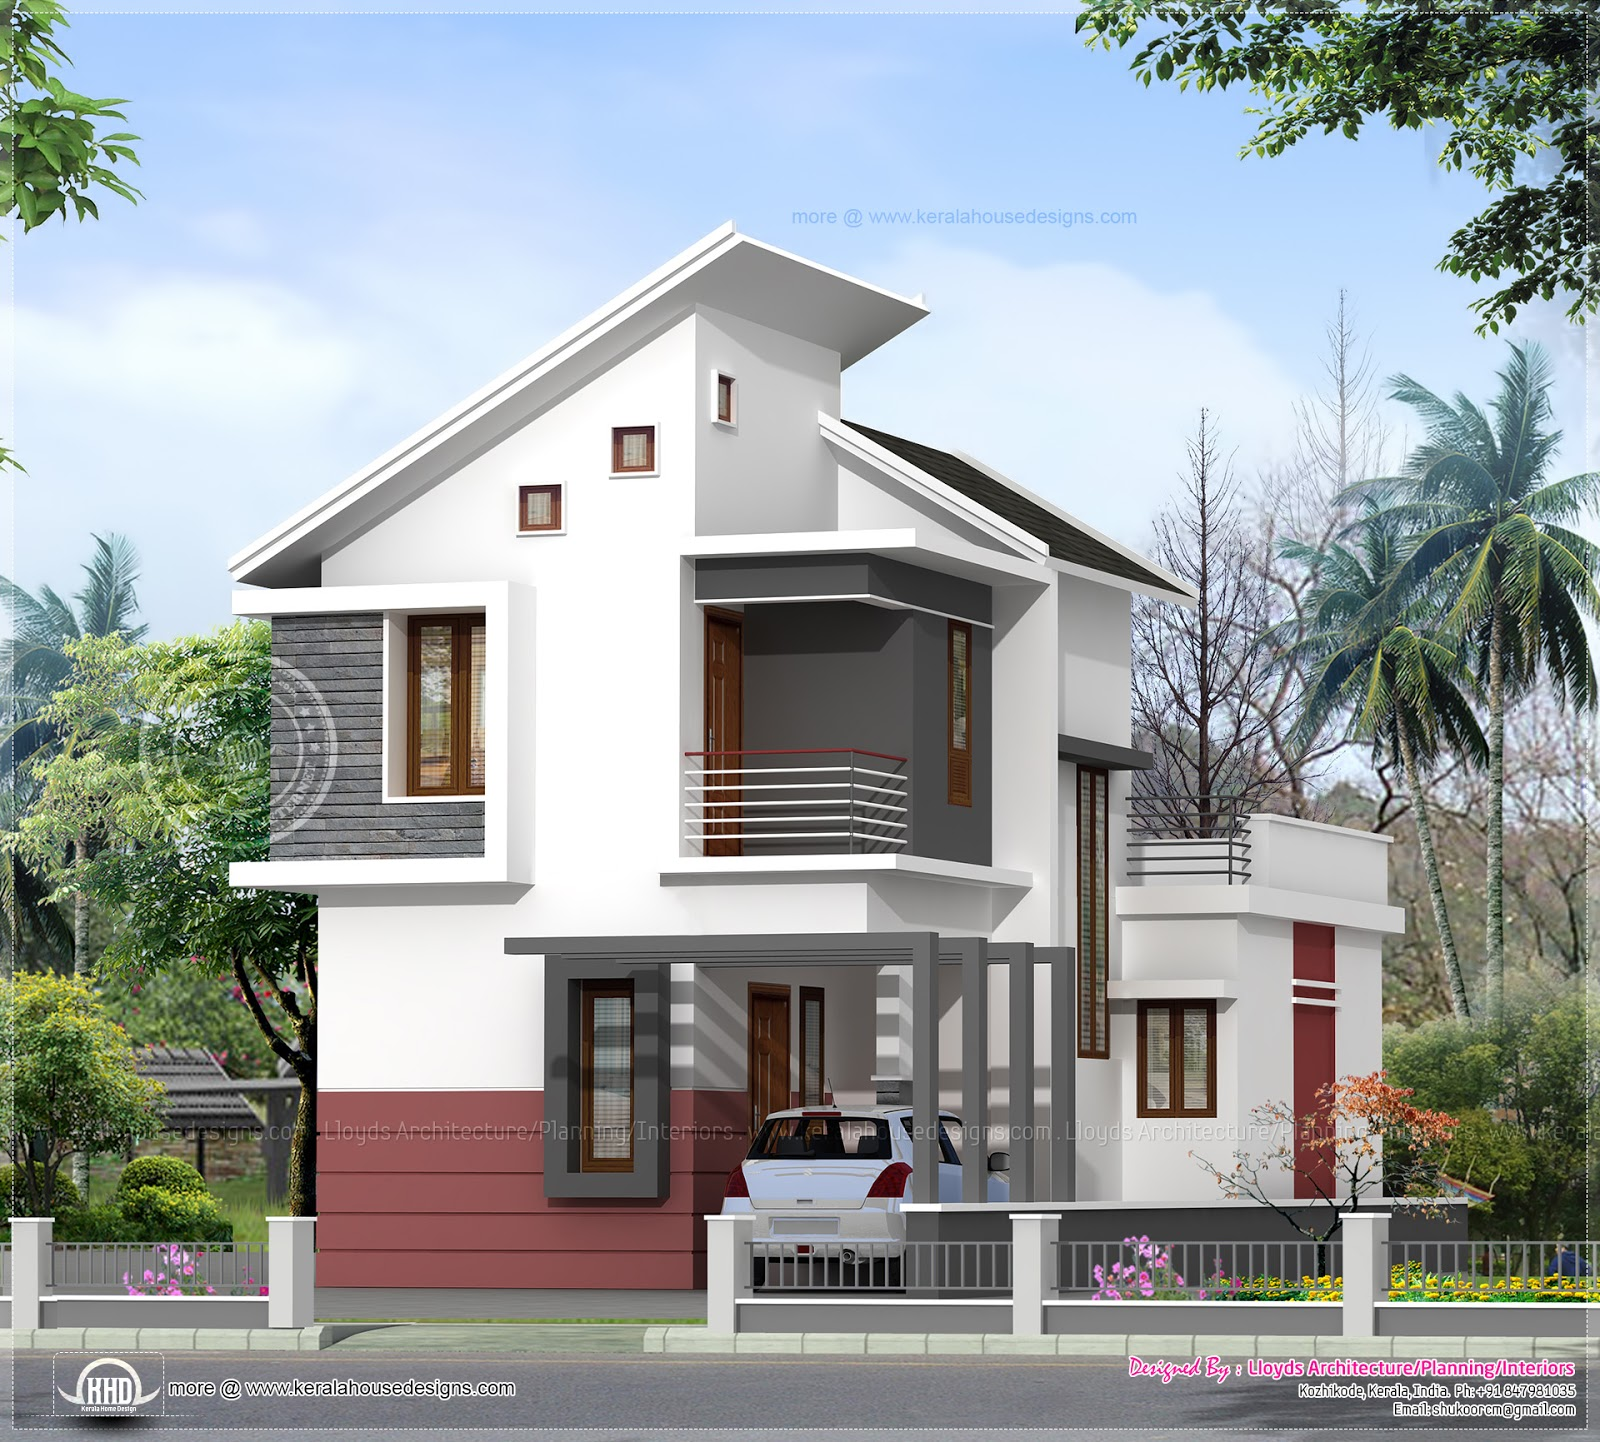 Strange 1197 Sq Ft 3 Bedroom Villa In 3 Cents Plot House Design Plans Largest Home Design Picture Inspirations Pitcheantrous